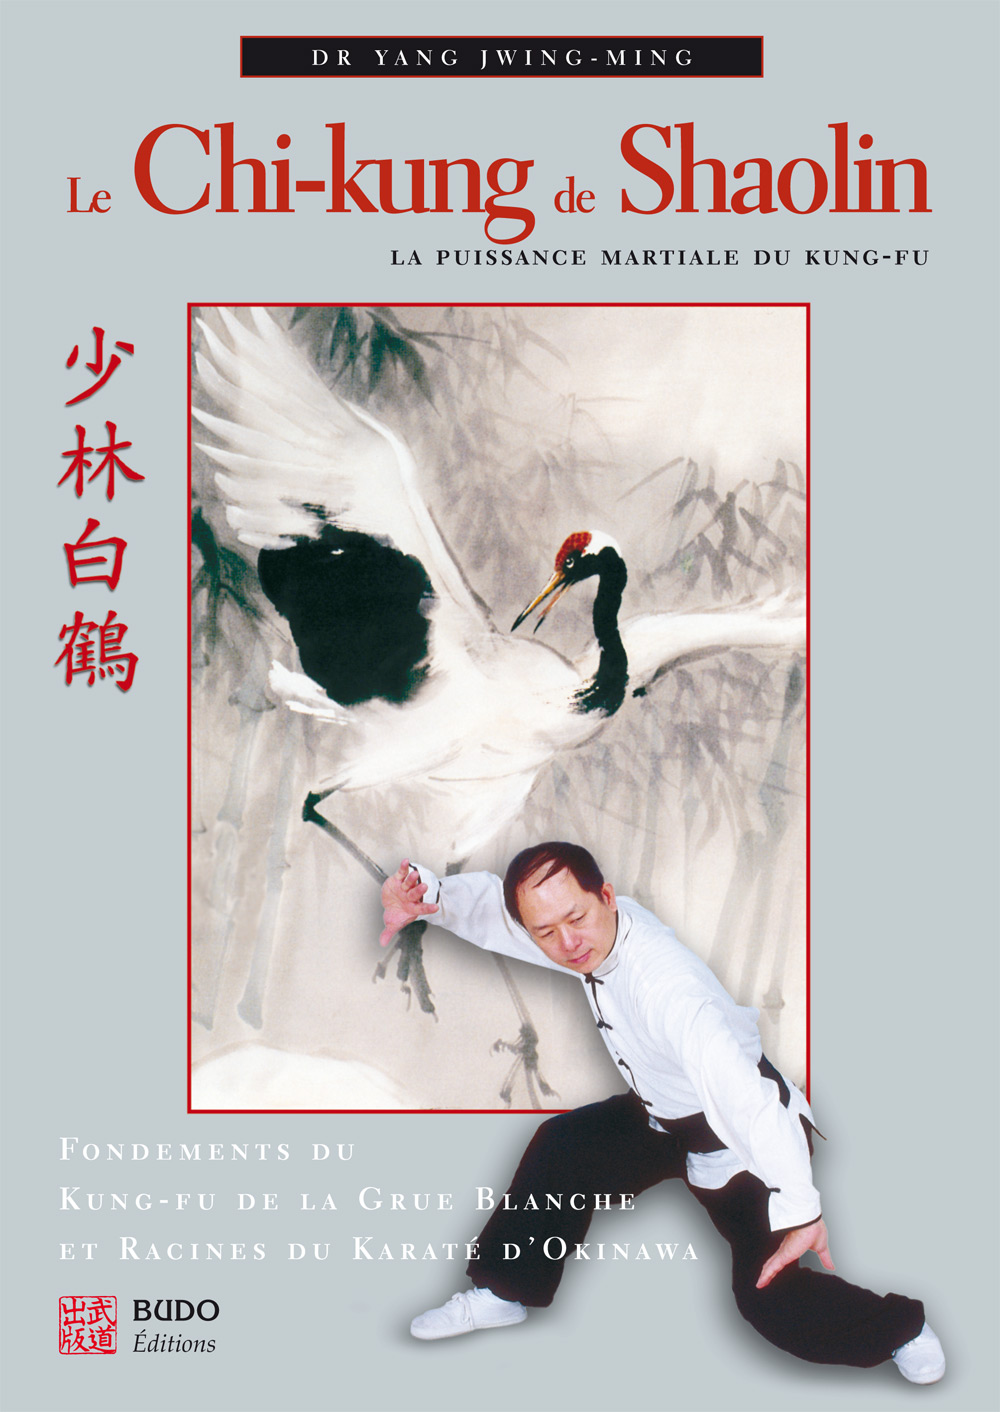 LE CHI-KUNG DE SHAOLIN puissance martiale kung-fu